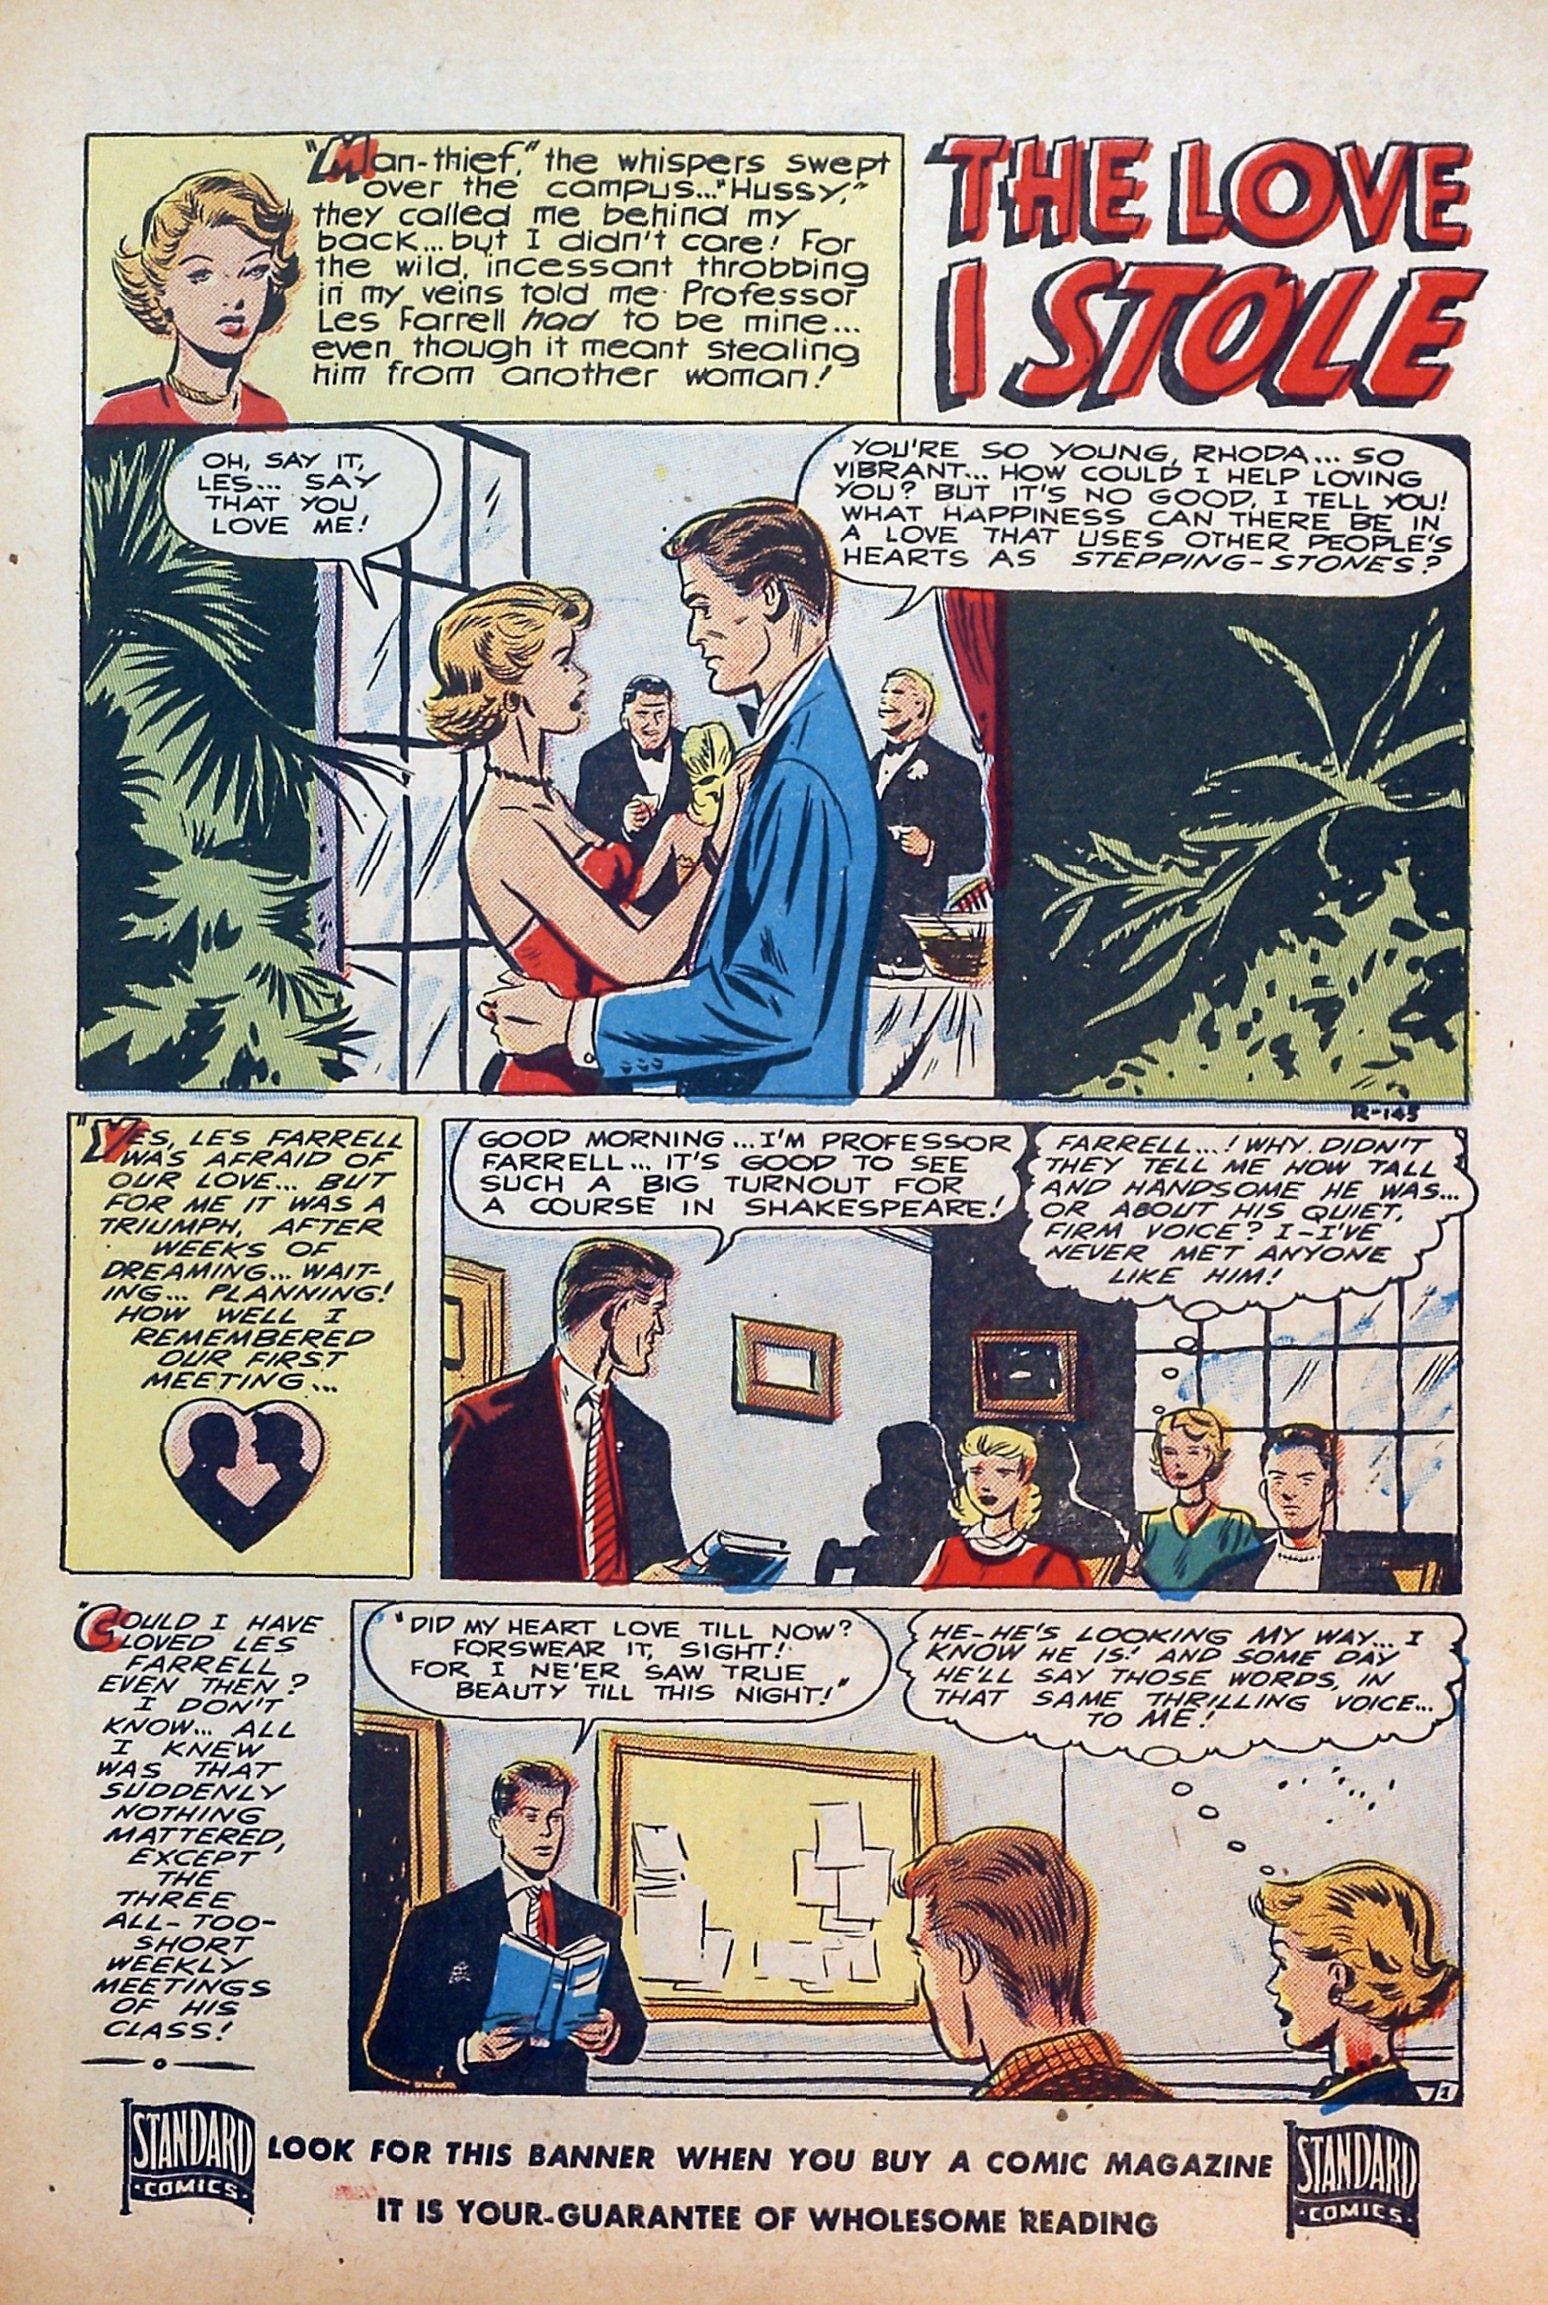 Digital Comic Museum Puts a Past Era In Your Hands